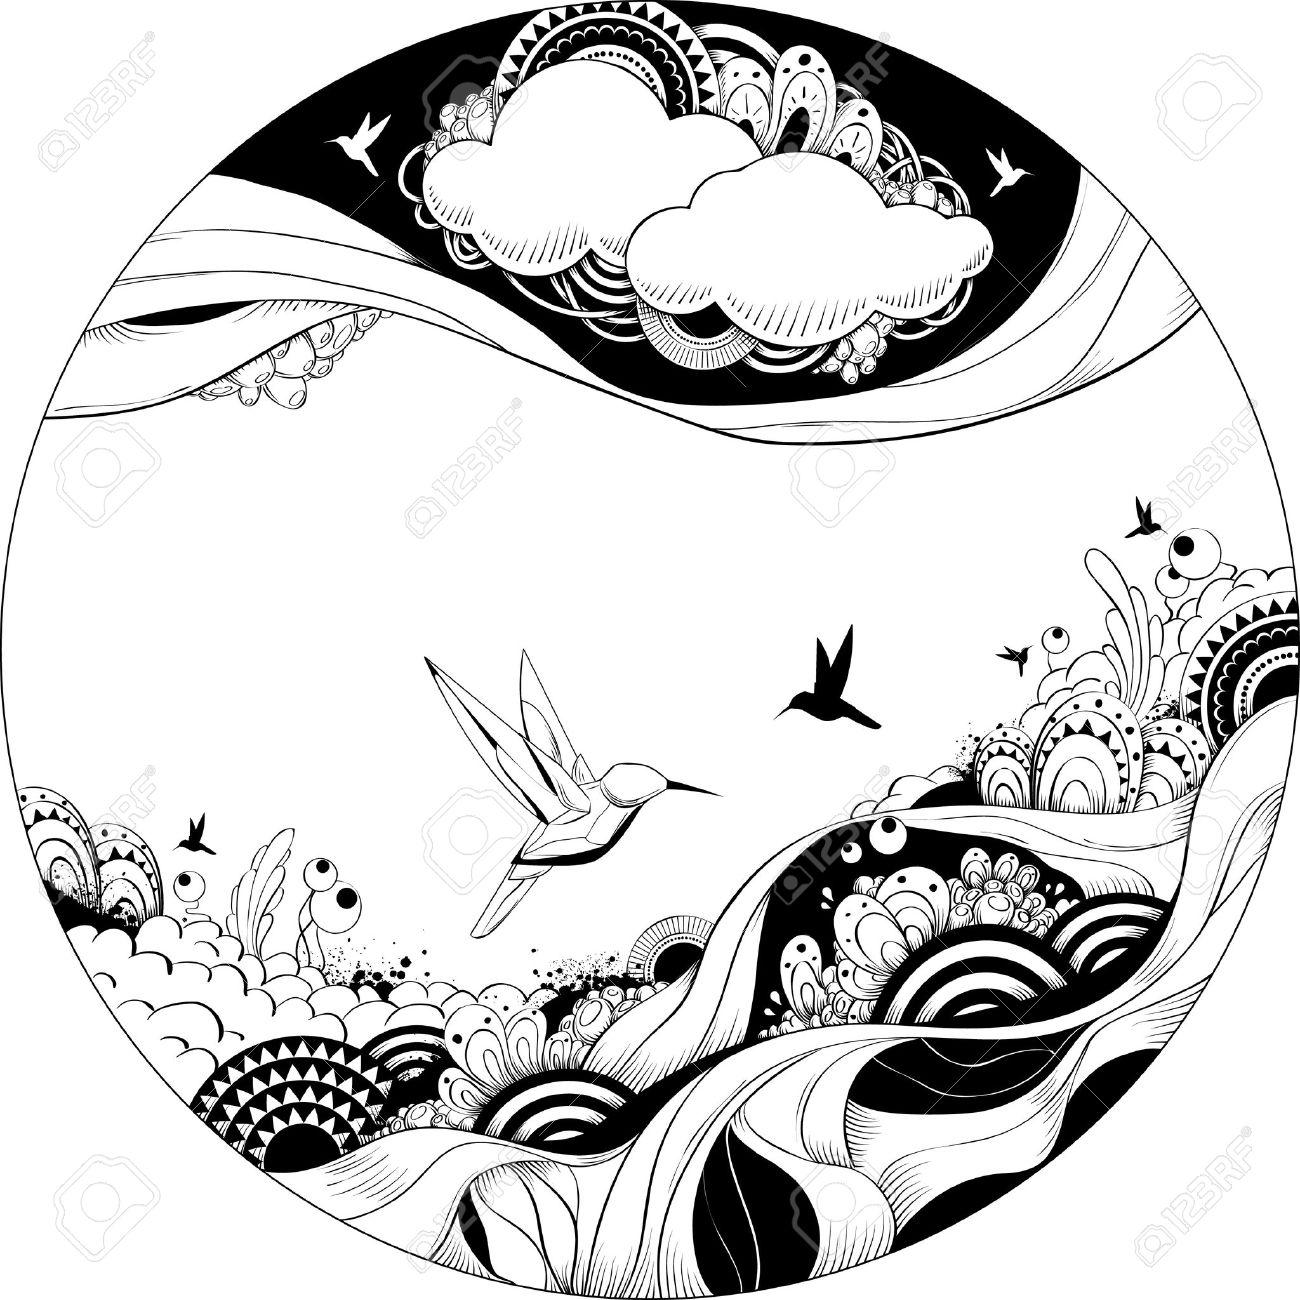 Bizarre vector illustration. Black and white ink sketch. Stock Vector - 6189069